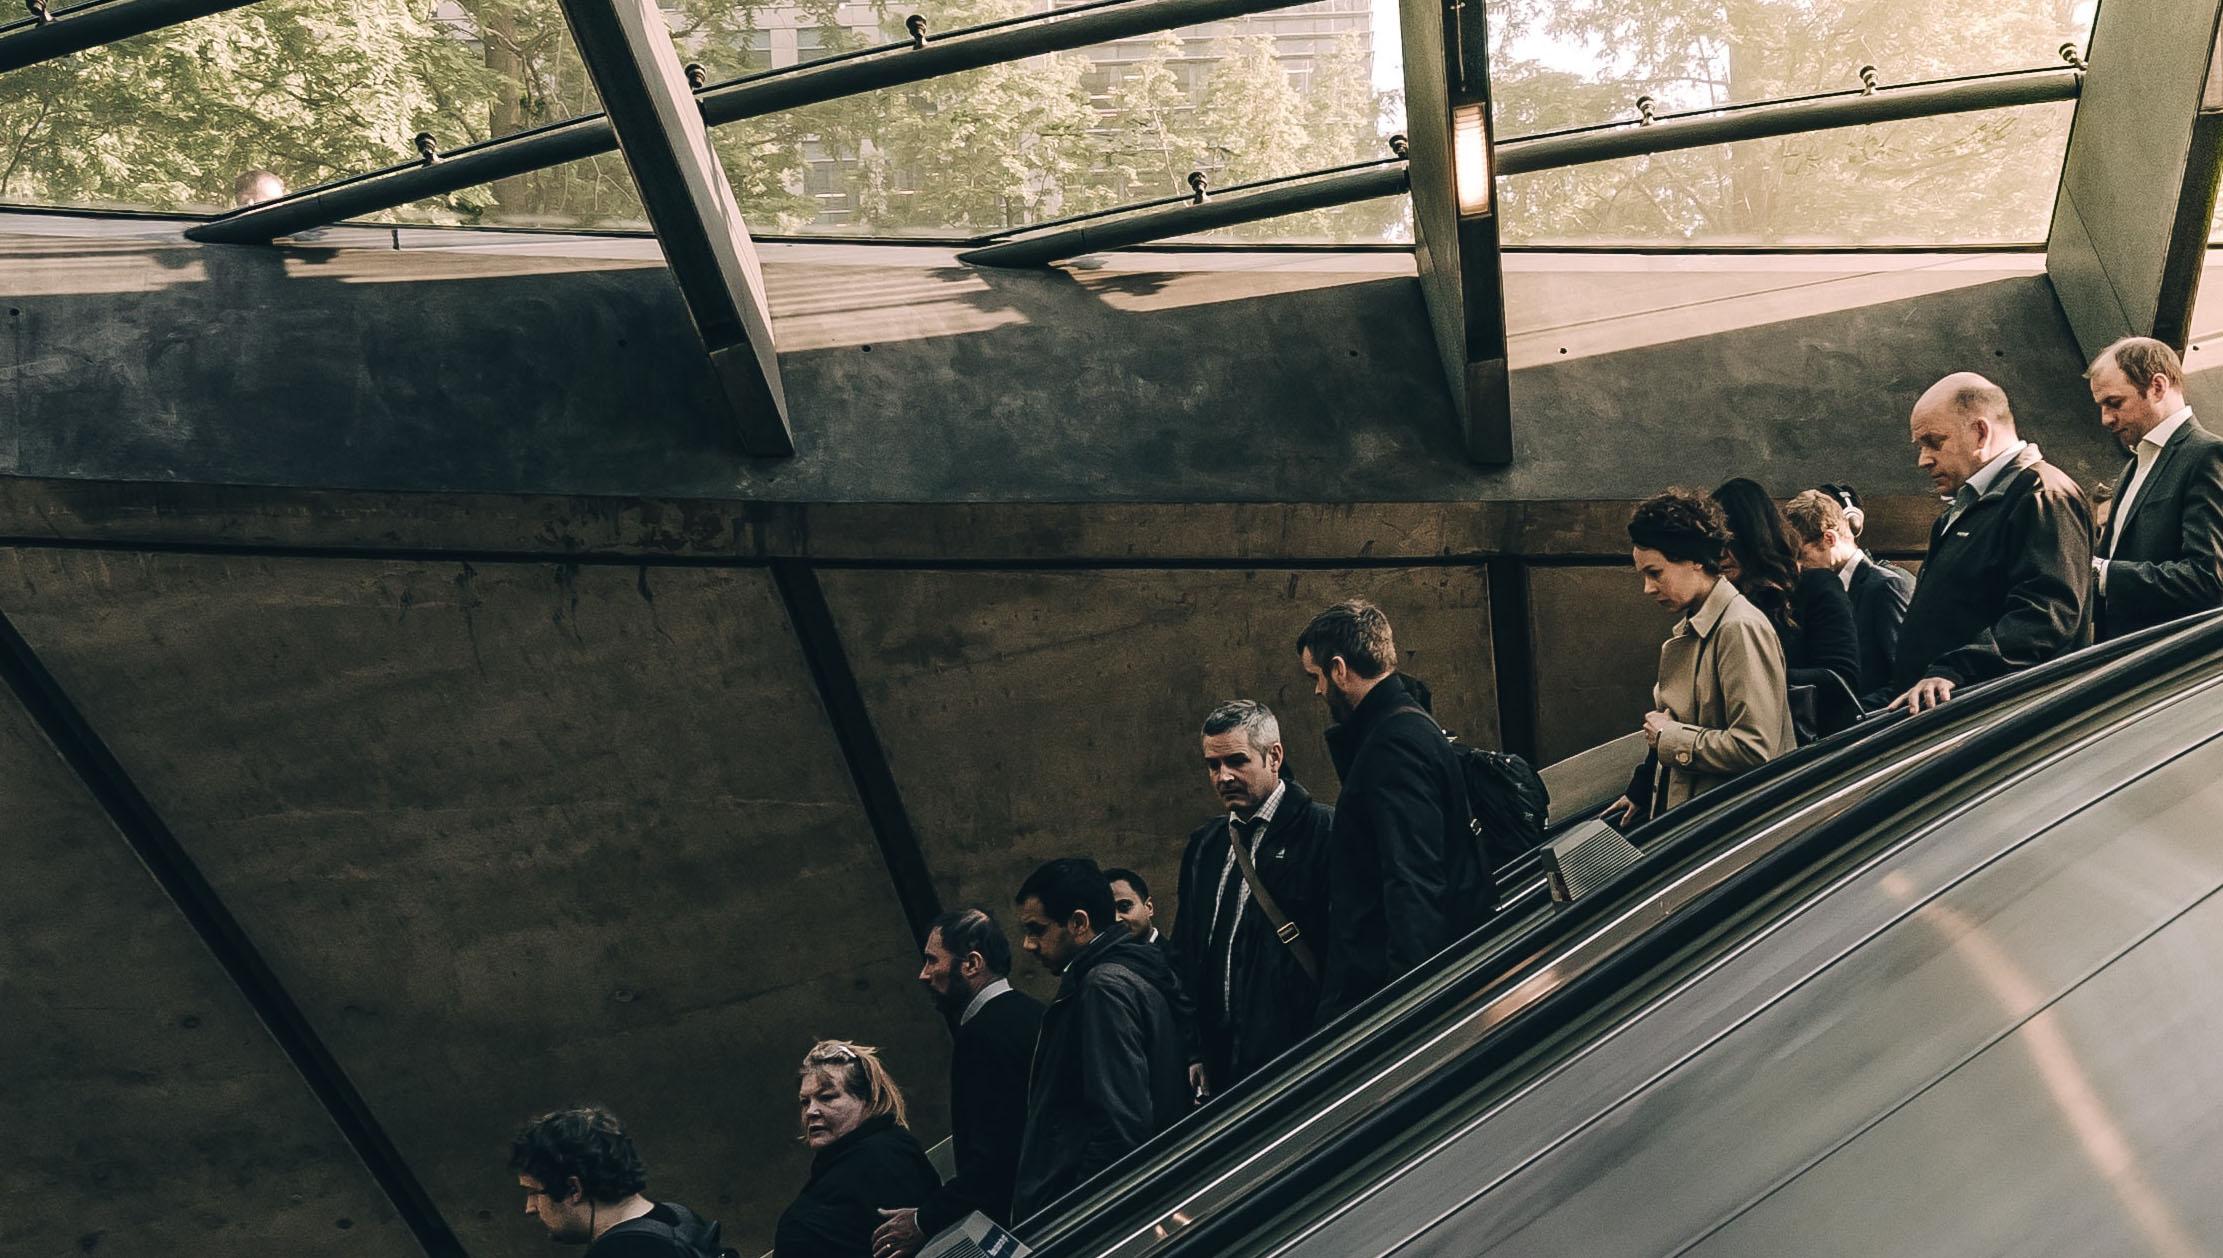 Do 'Fake Commutes' Stimulate Productivity?